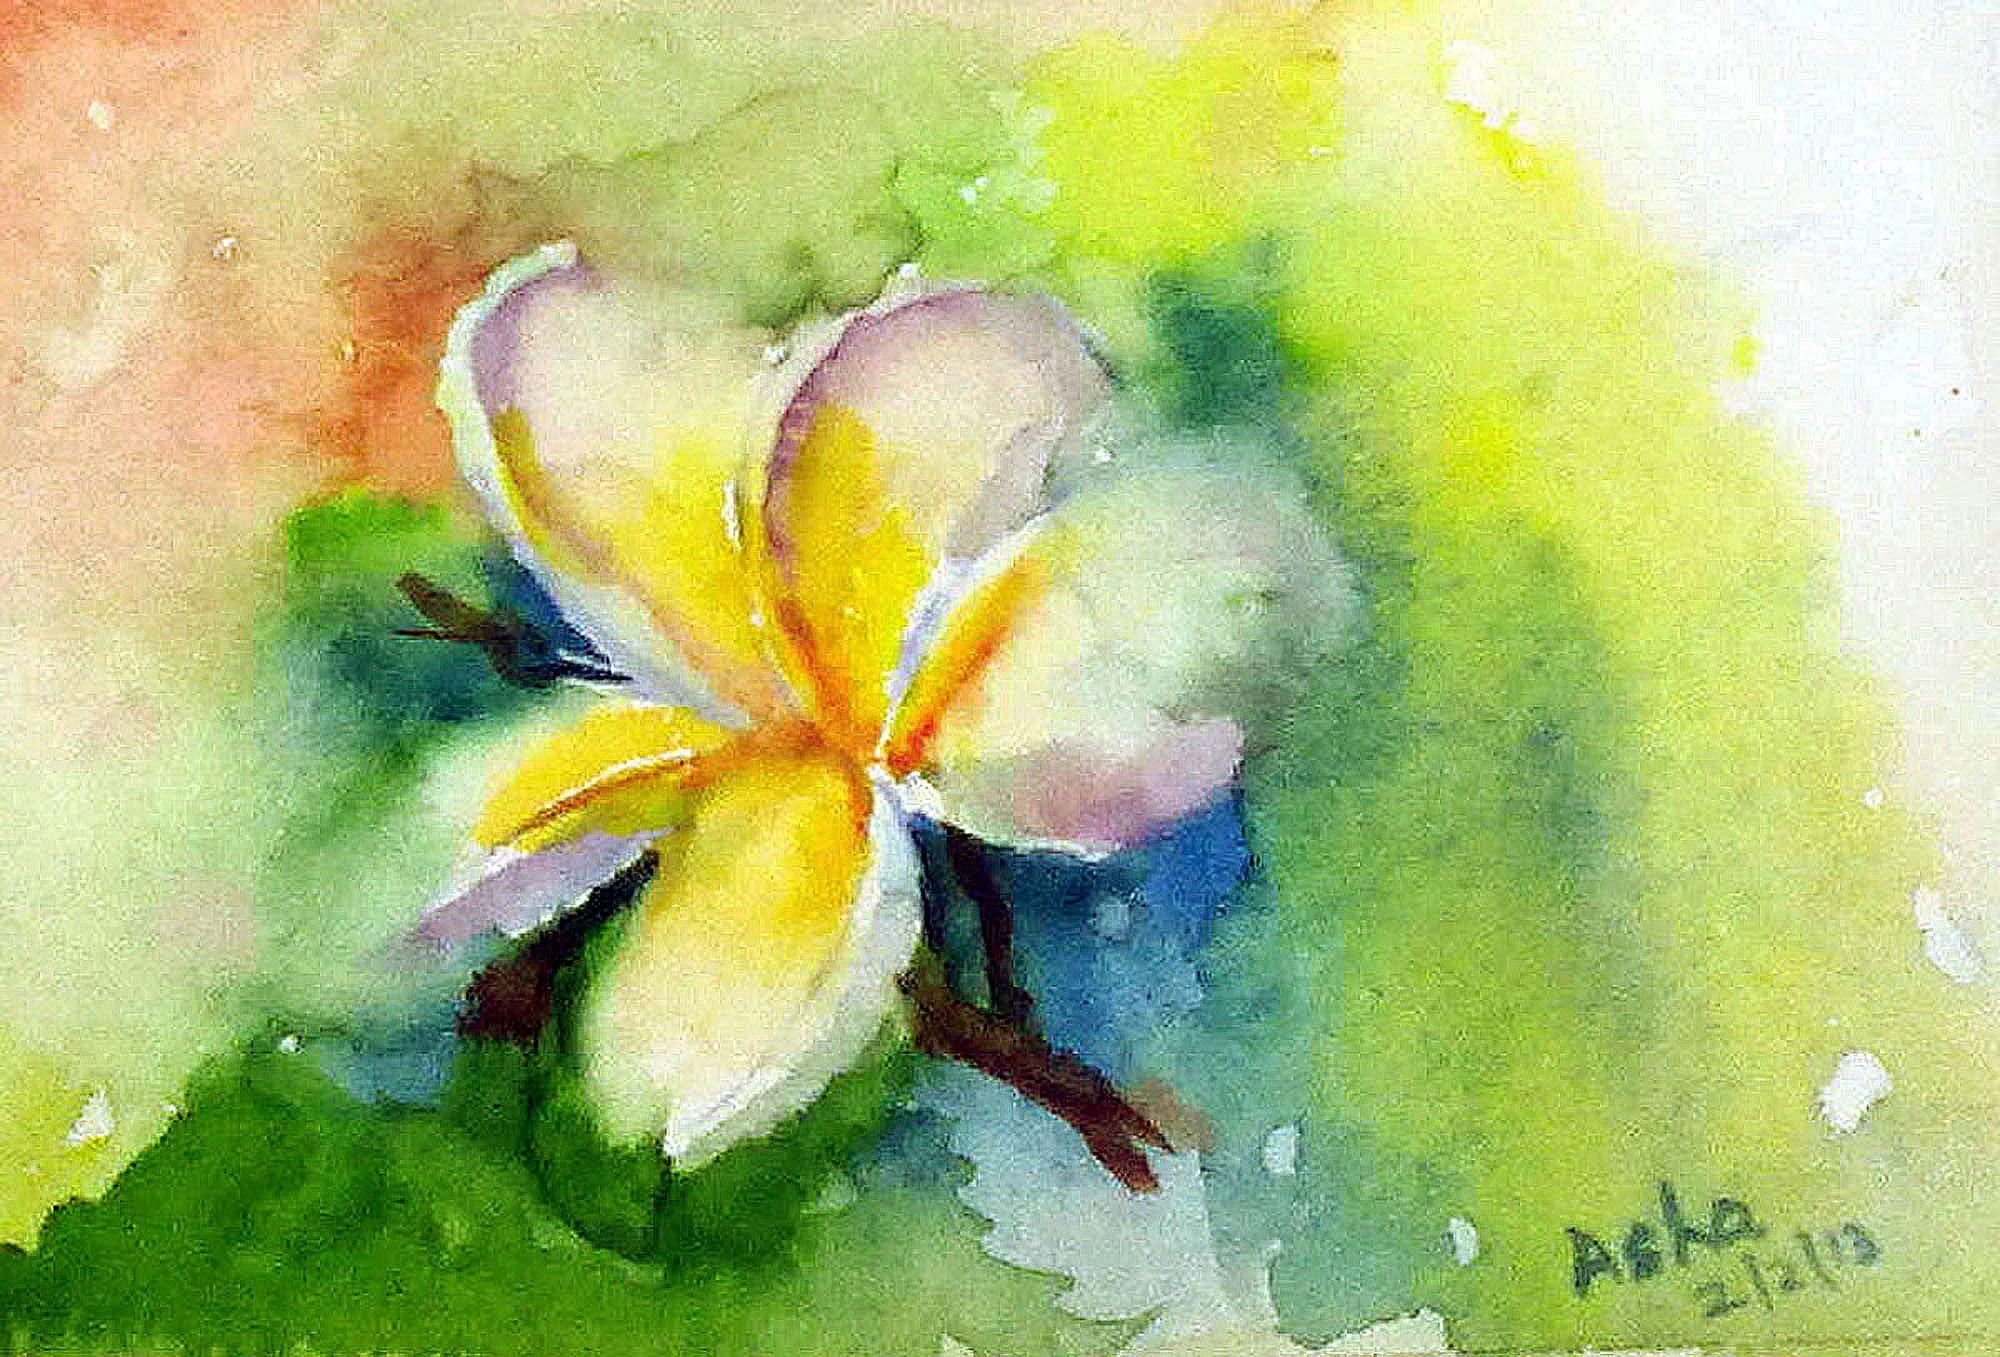 Frangipani Plumeria Flowers Watercolors Original Art Wallart Walldecor Impressionistic Watercolor Flora Loose Watercolor Paintings Floral Watercolor Watercolor